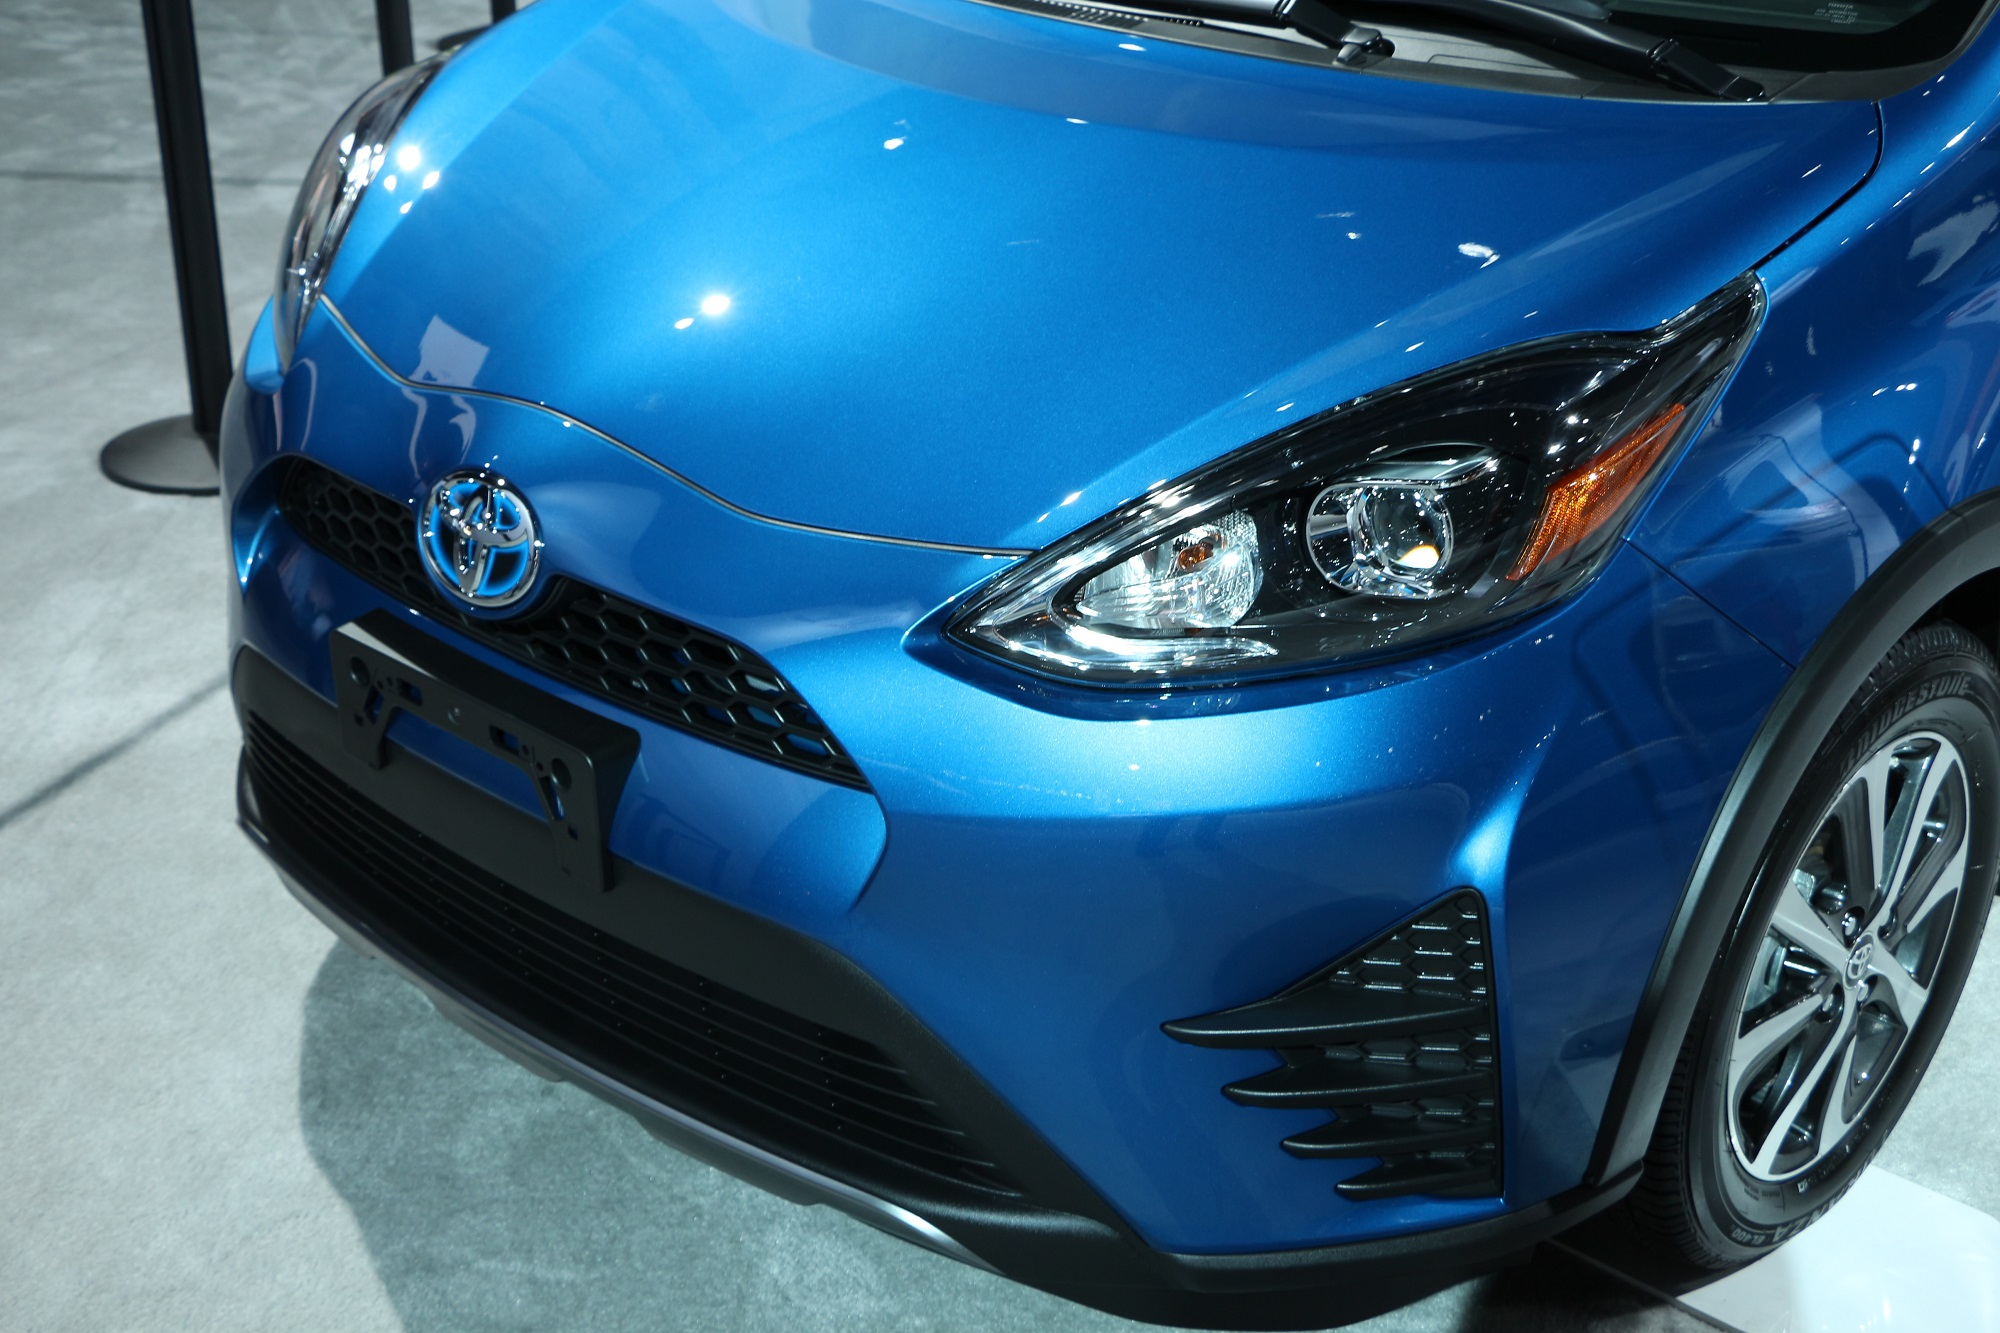 scionlife.com 2017 2018 Toyota Yaris Camry Avalon GT86 86 Corolla iM Prius